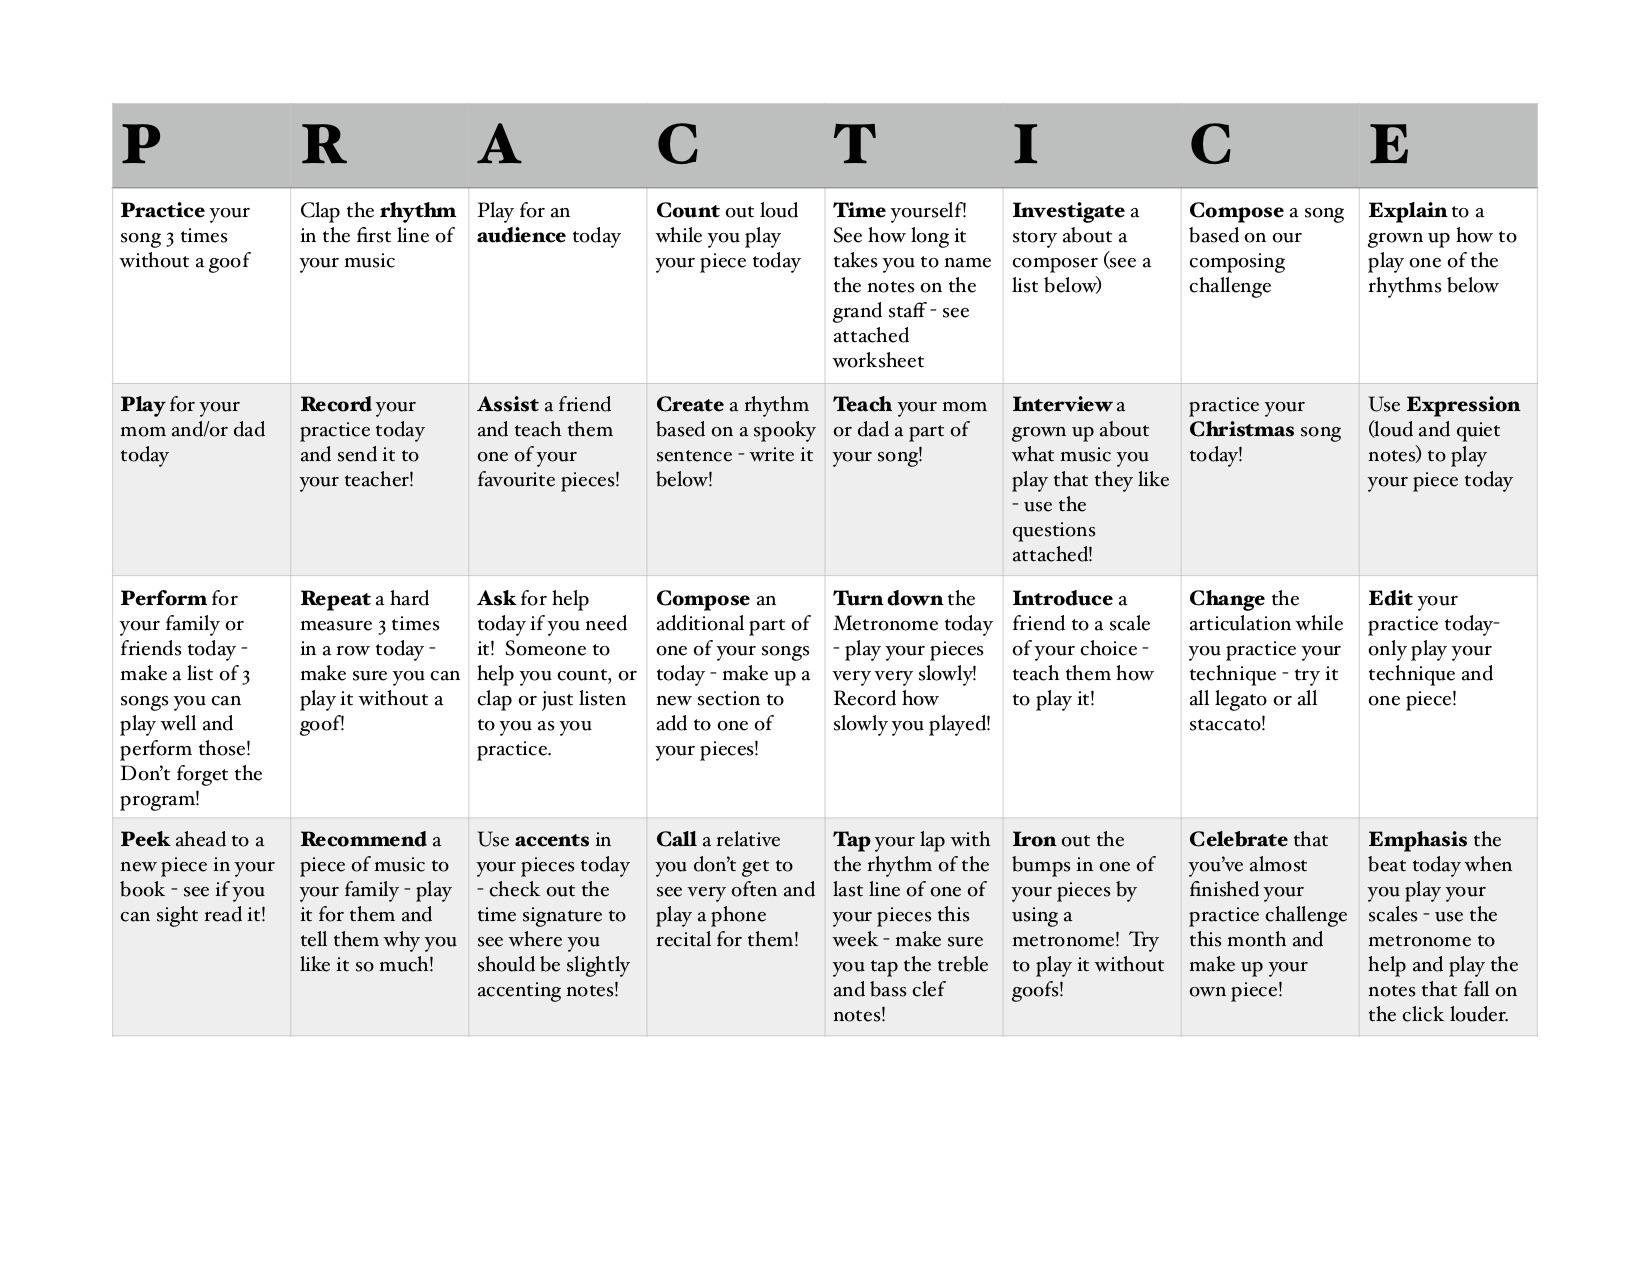 November Practice Challenge.jpg